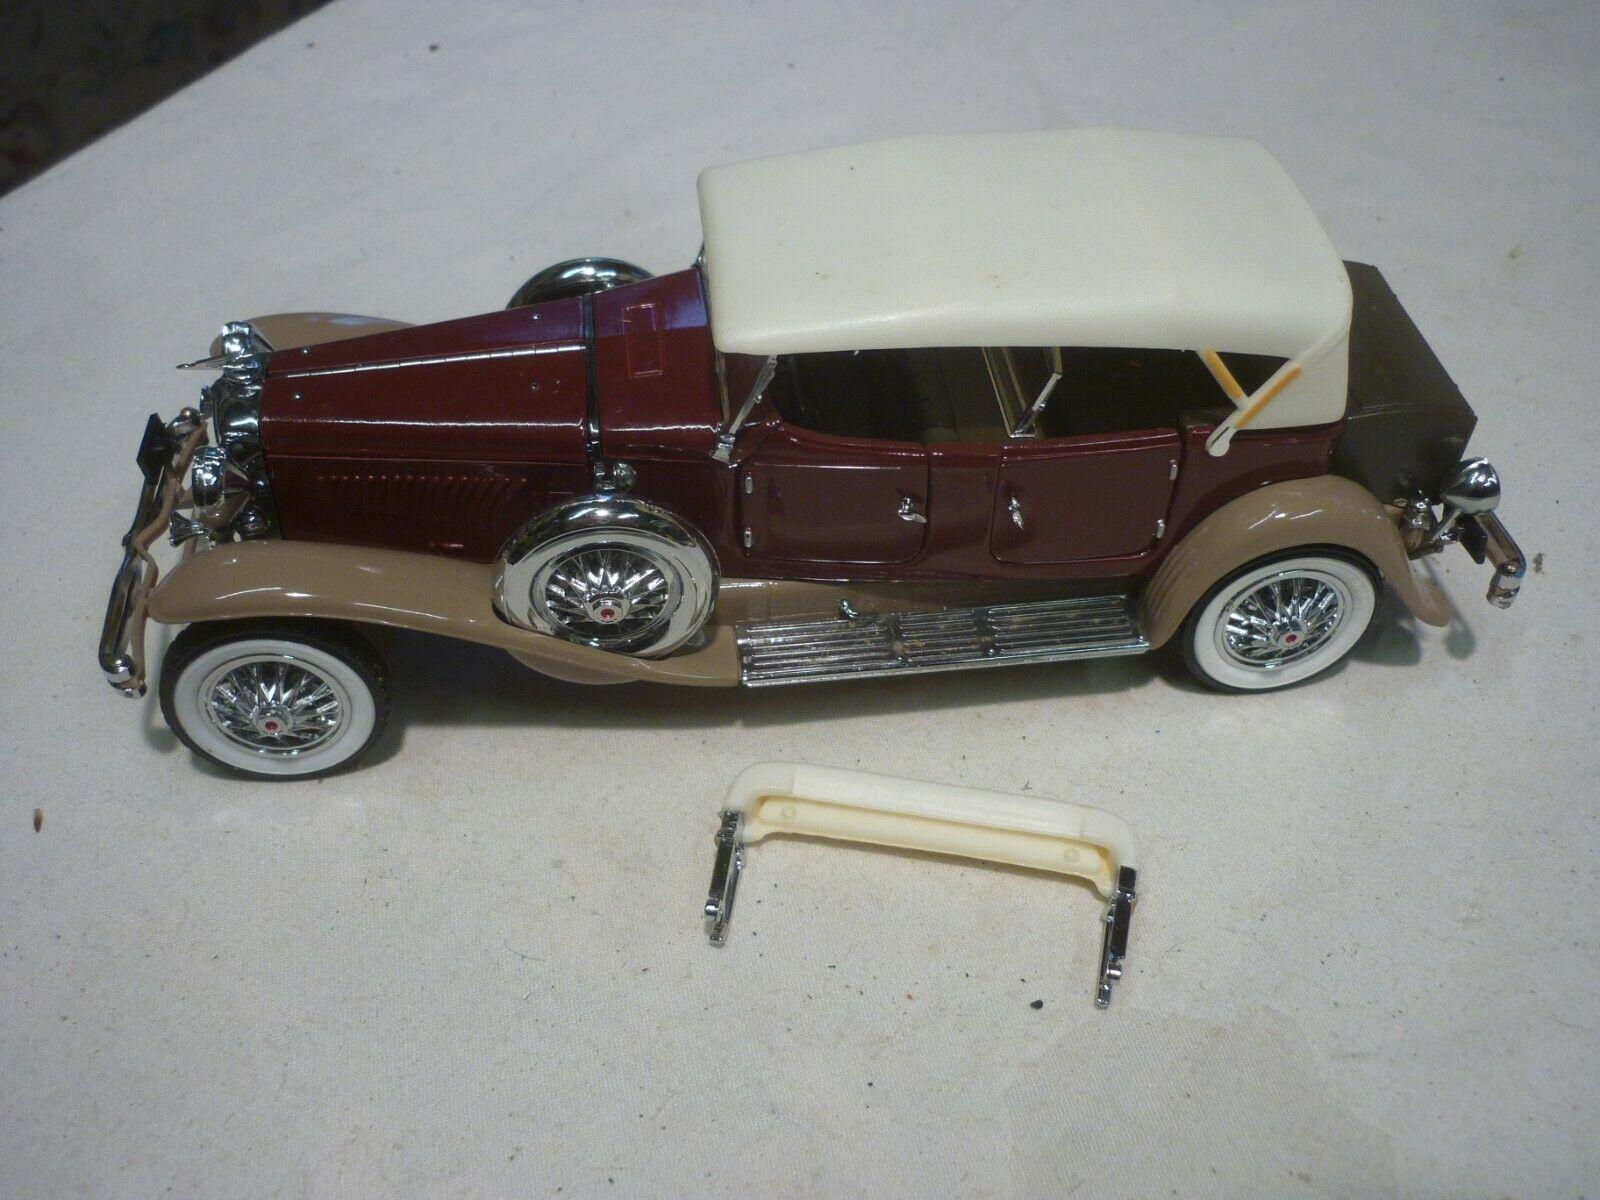 A Franklin mint scale model car of a 1930 Duesenberg J Derham Phaeton, no box